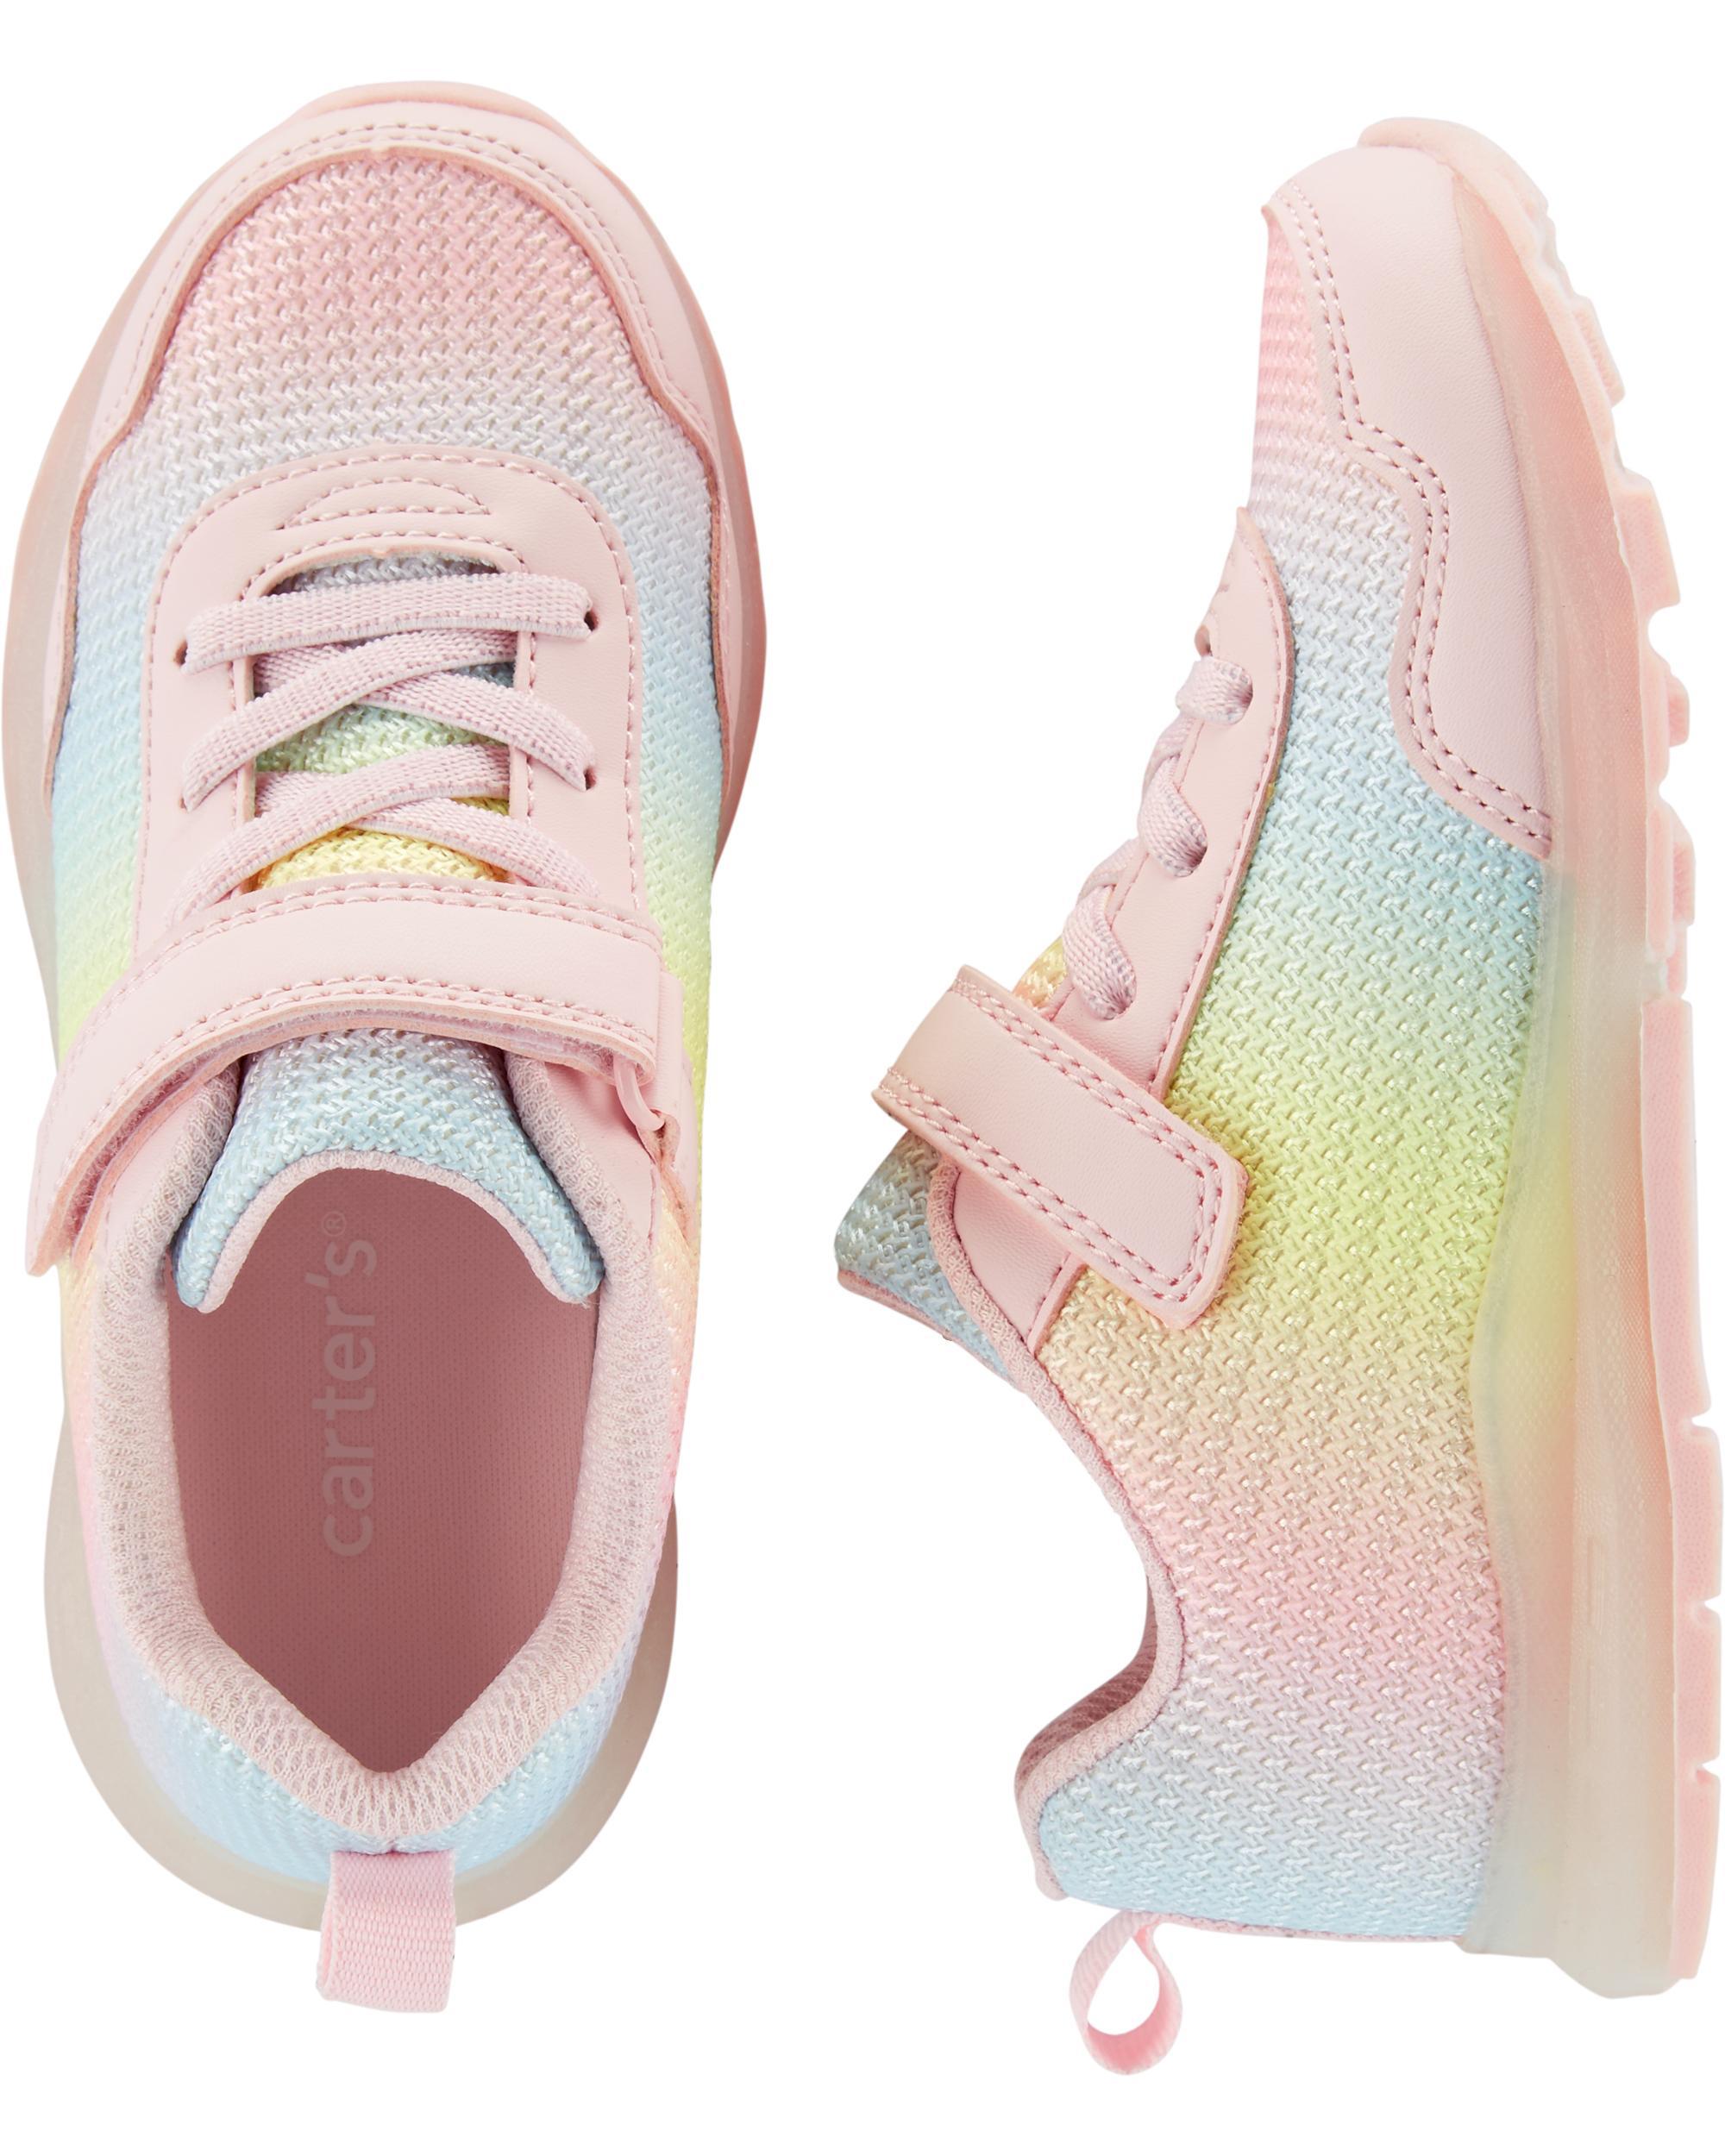 e1d741a1bf Carter's Rainbow Light-Up Sneakers | carters.com